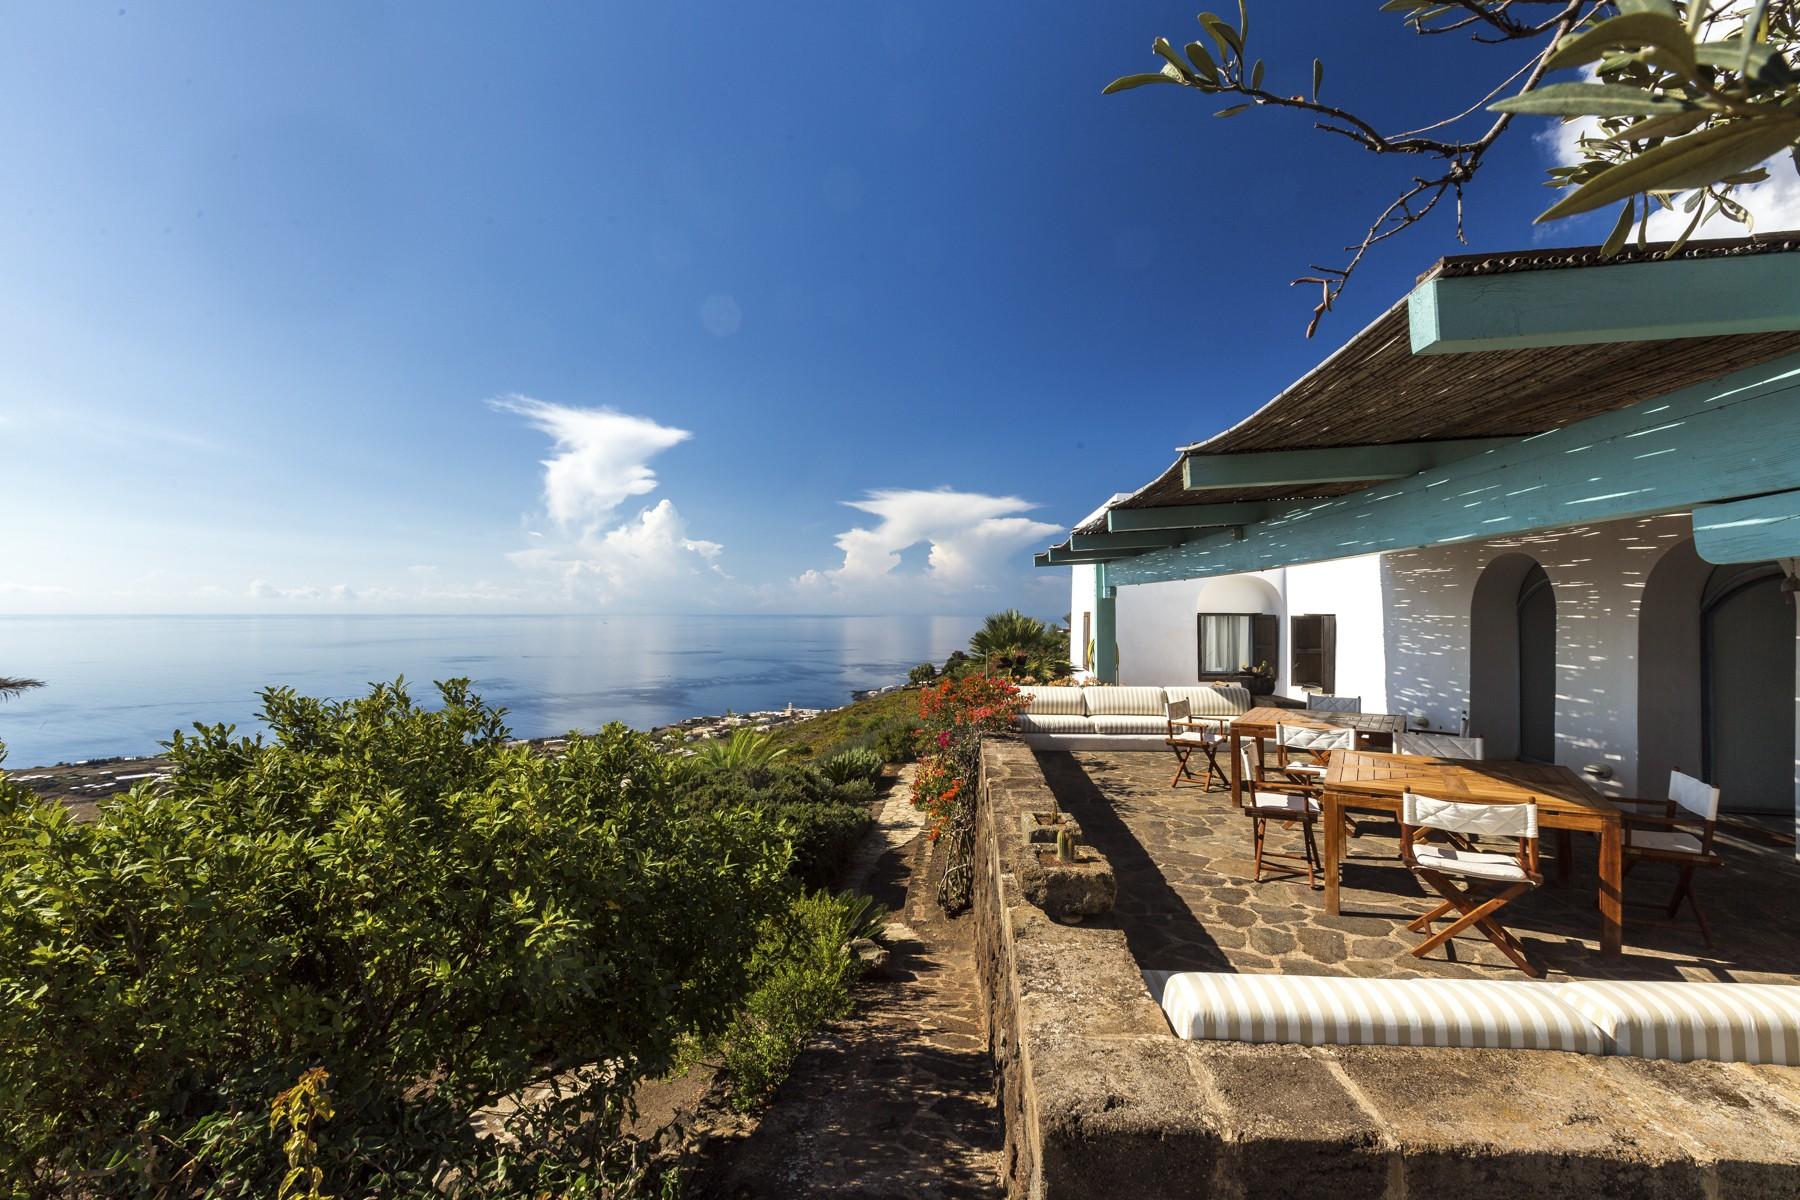 Villa in Vendita a Pantelleria: 5 locali, 530 mq - Foto 3